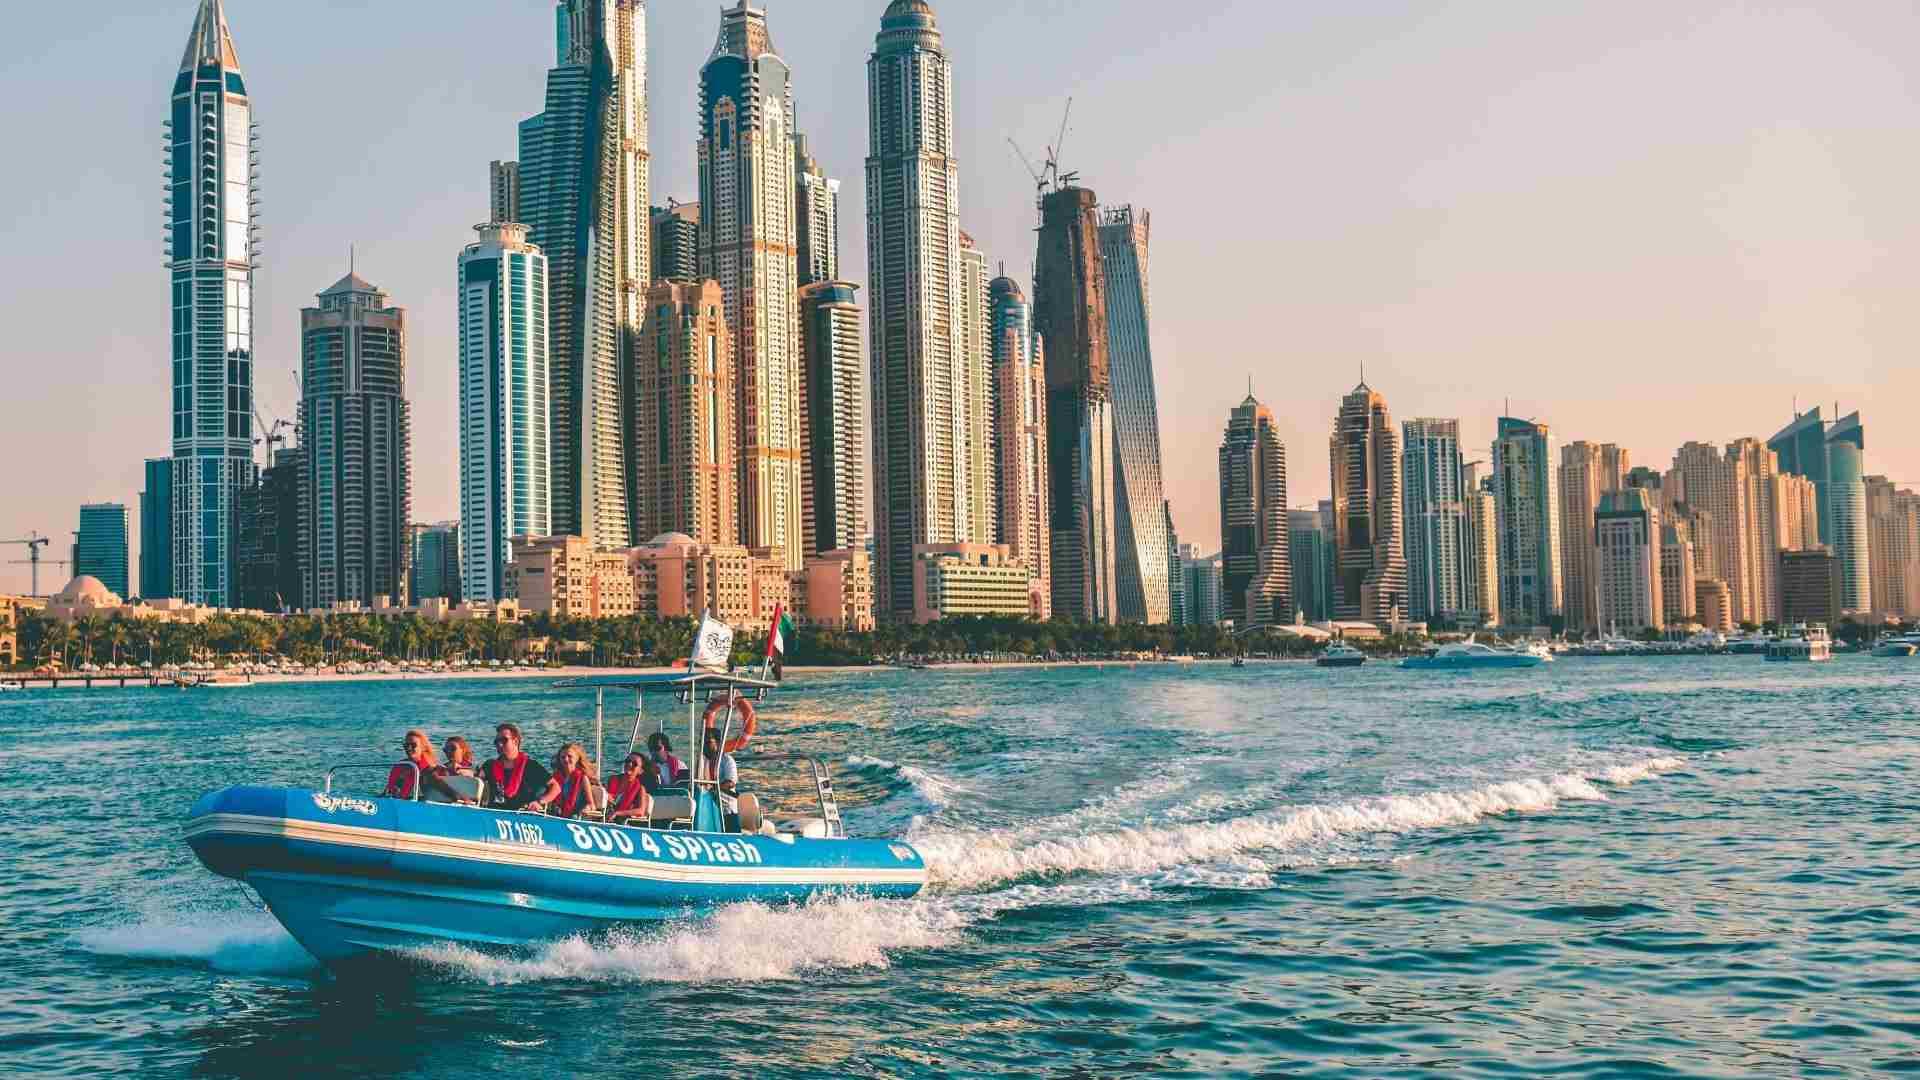 Splash tours boat in the gulf